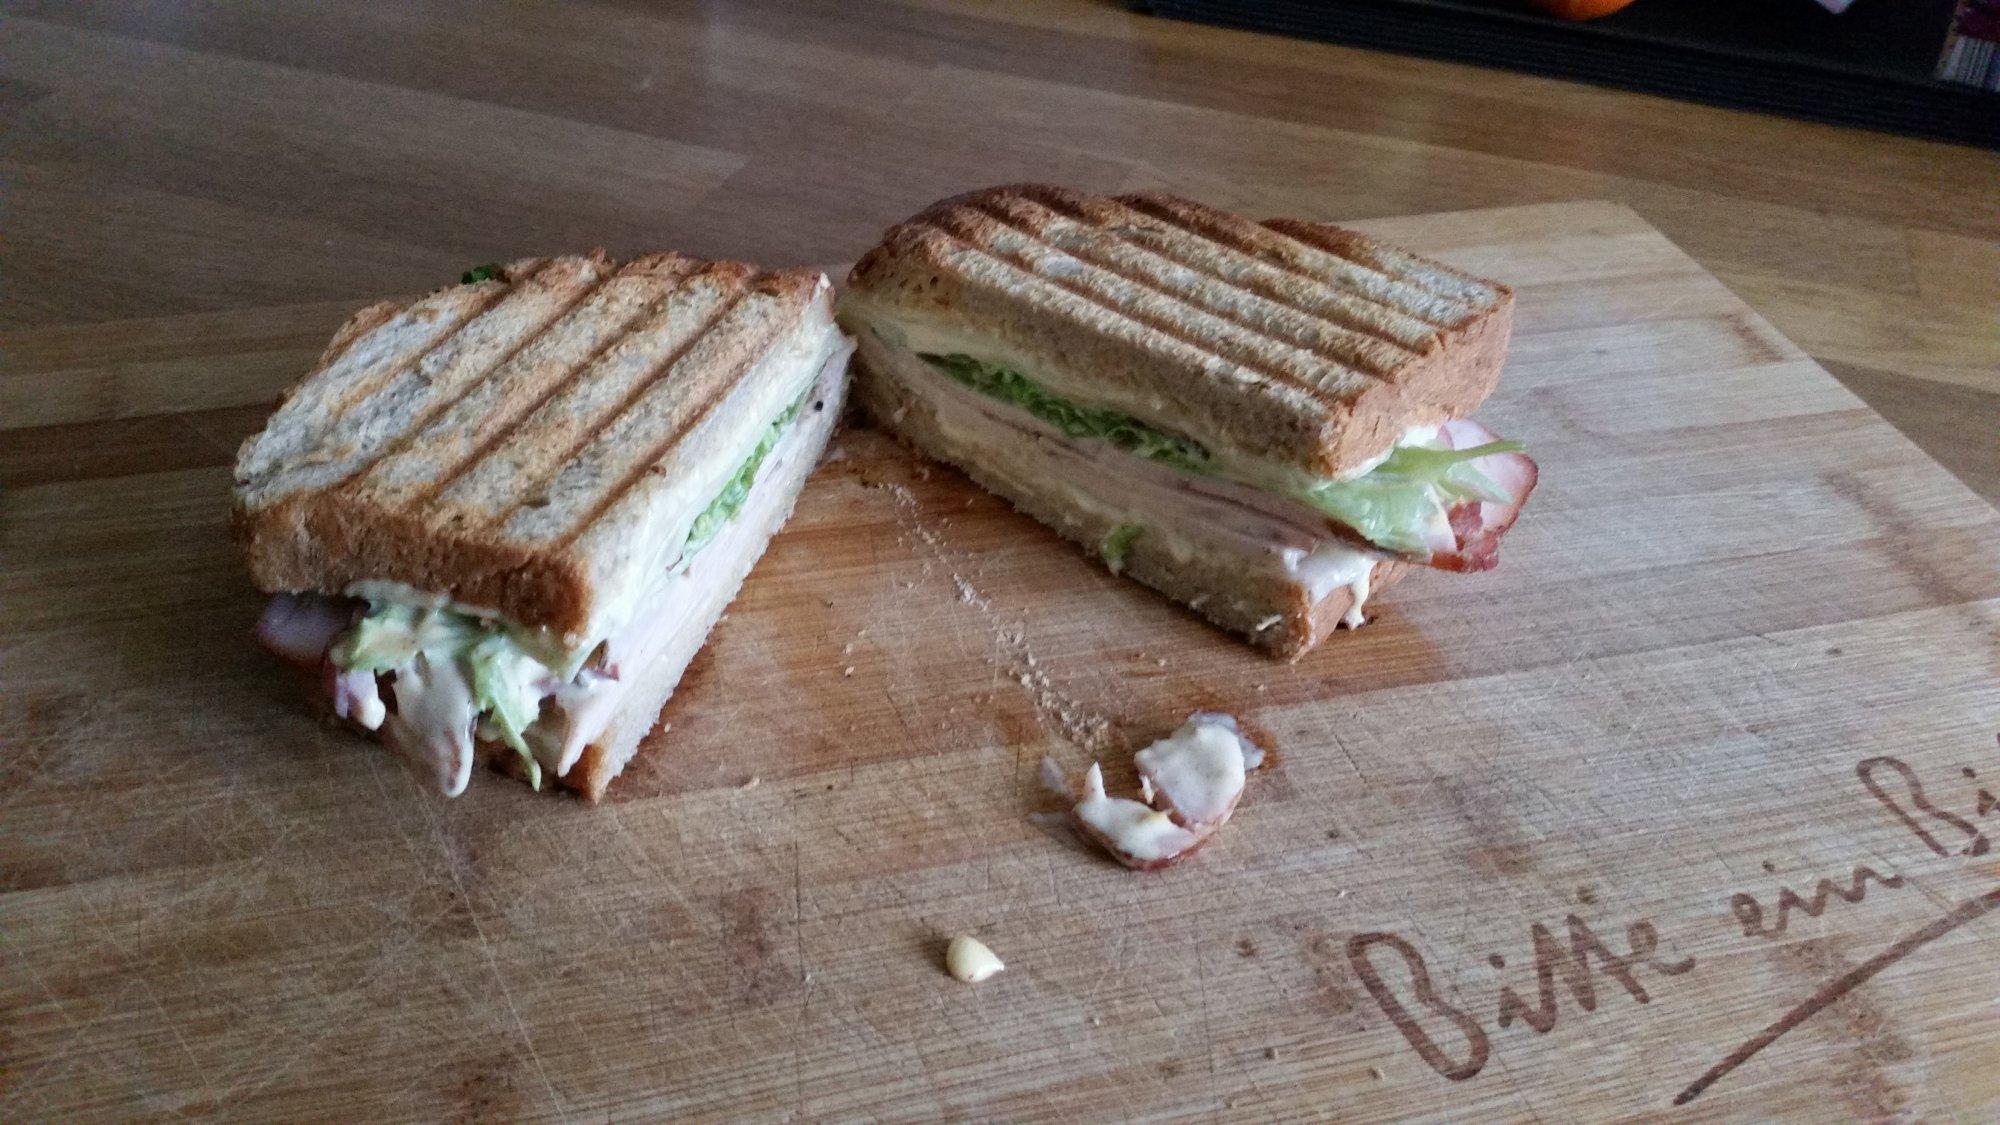 sandwich-2-jpg.1414122